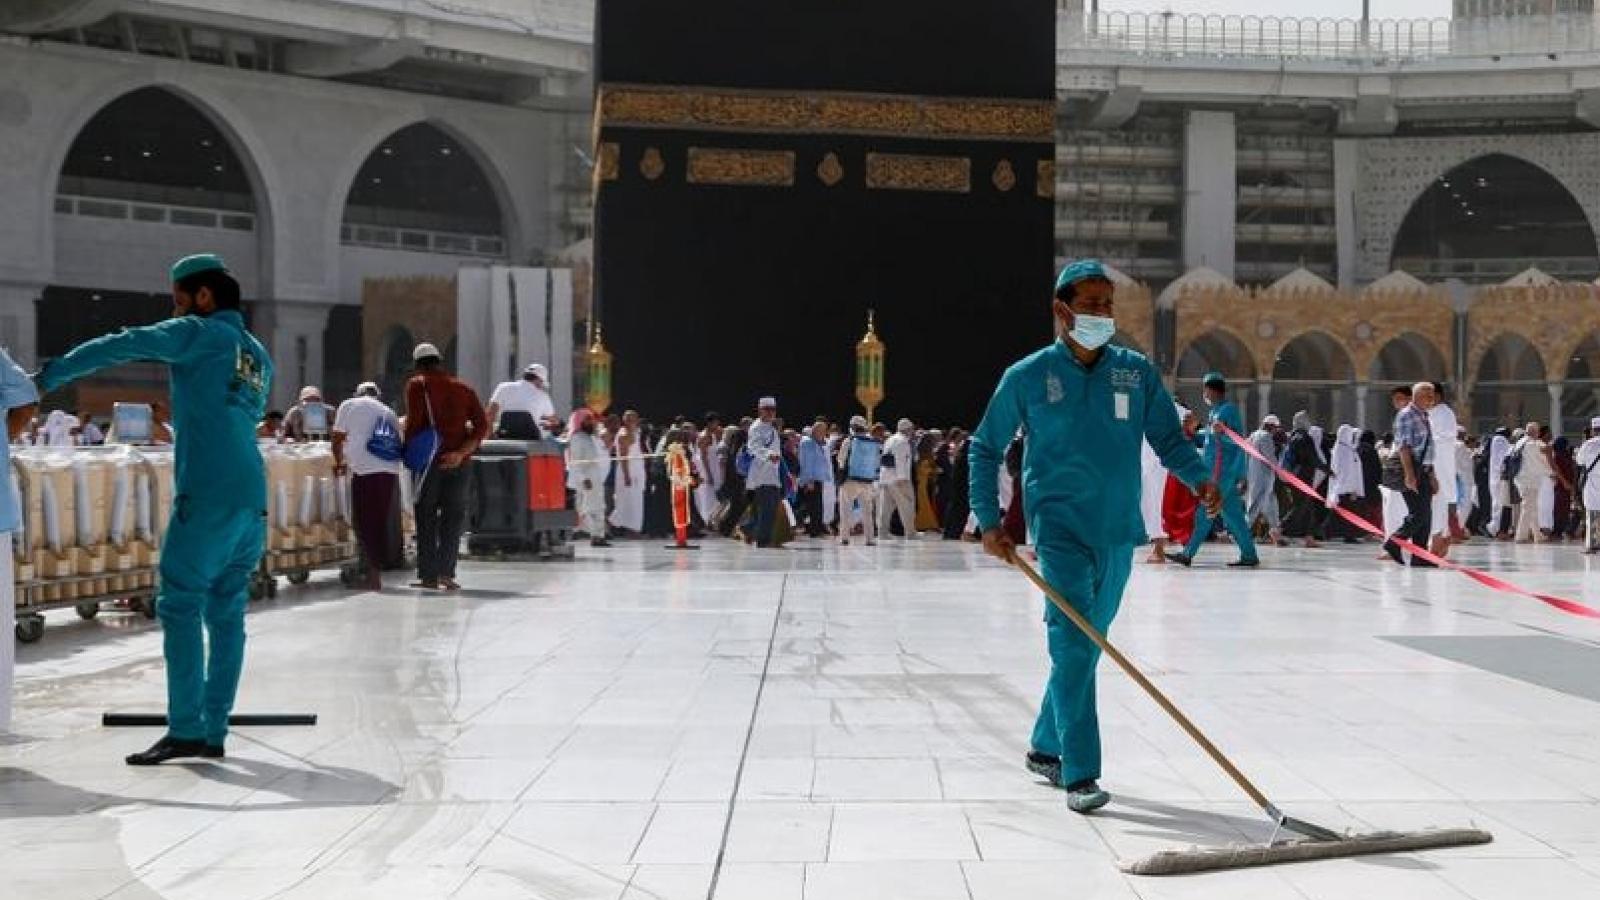 Sợ Covid-19, Saudi Arabia và UAE vẫn đóng cửa nhà thờ dịp Eid Al-Fitr